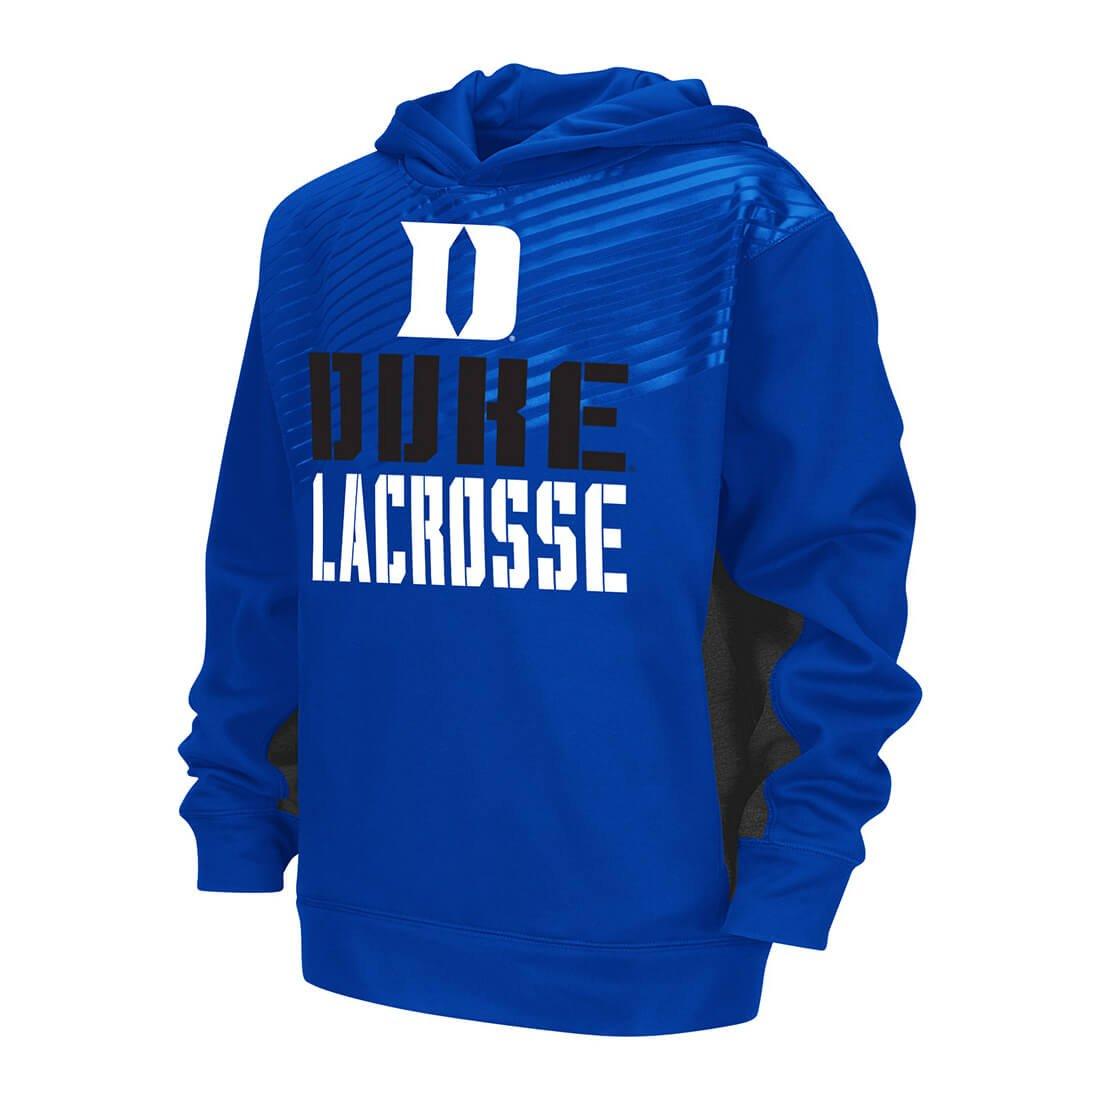 0e81bcaa51d Amazon.com : Duke Lacrosse Hoodie-Youth-Large : Sports & Outdoors